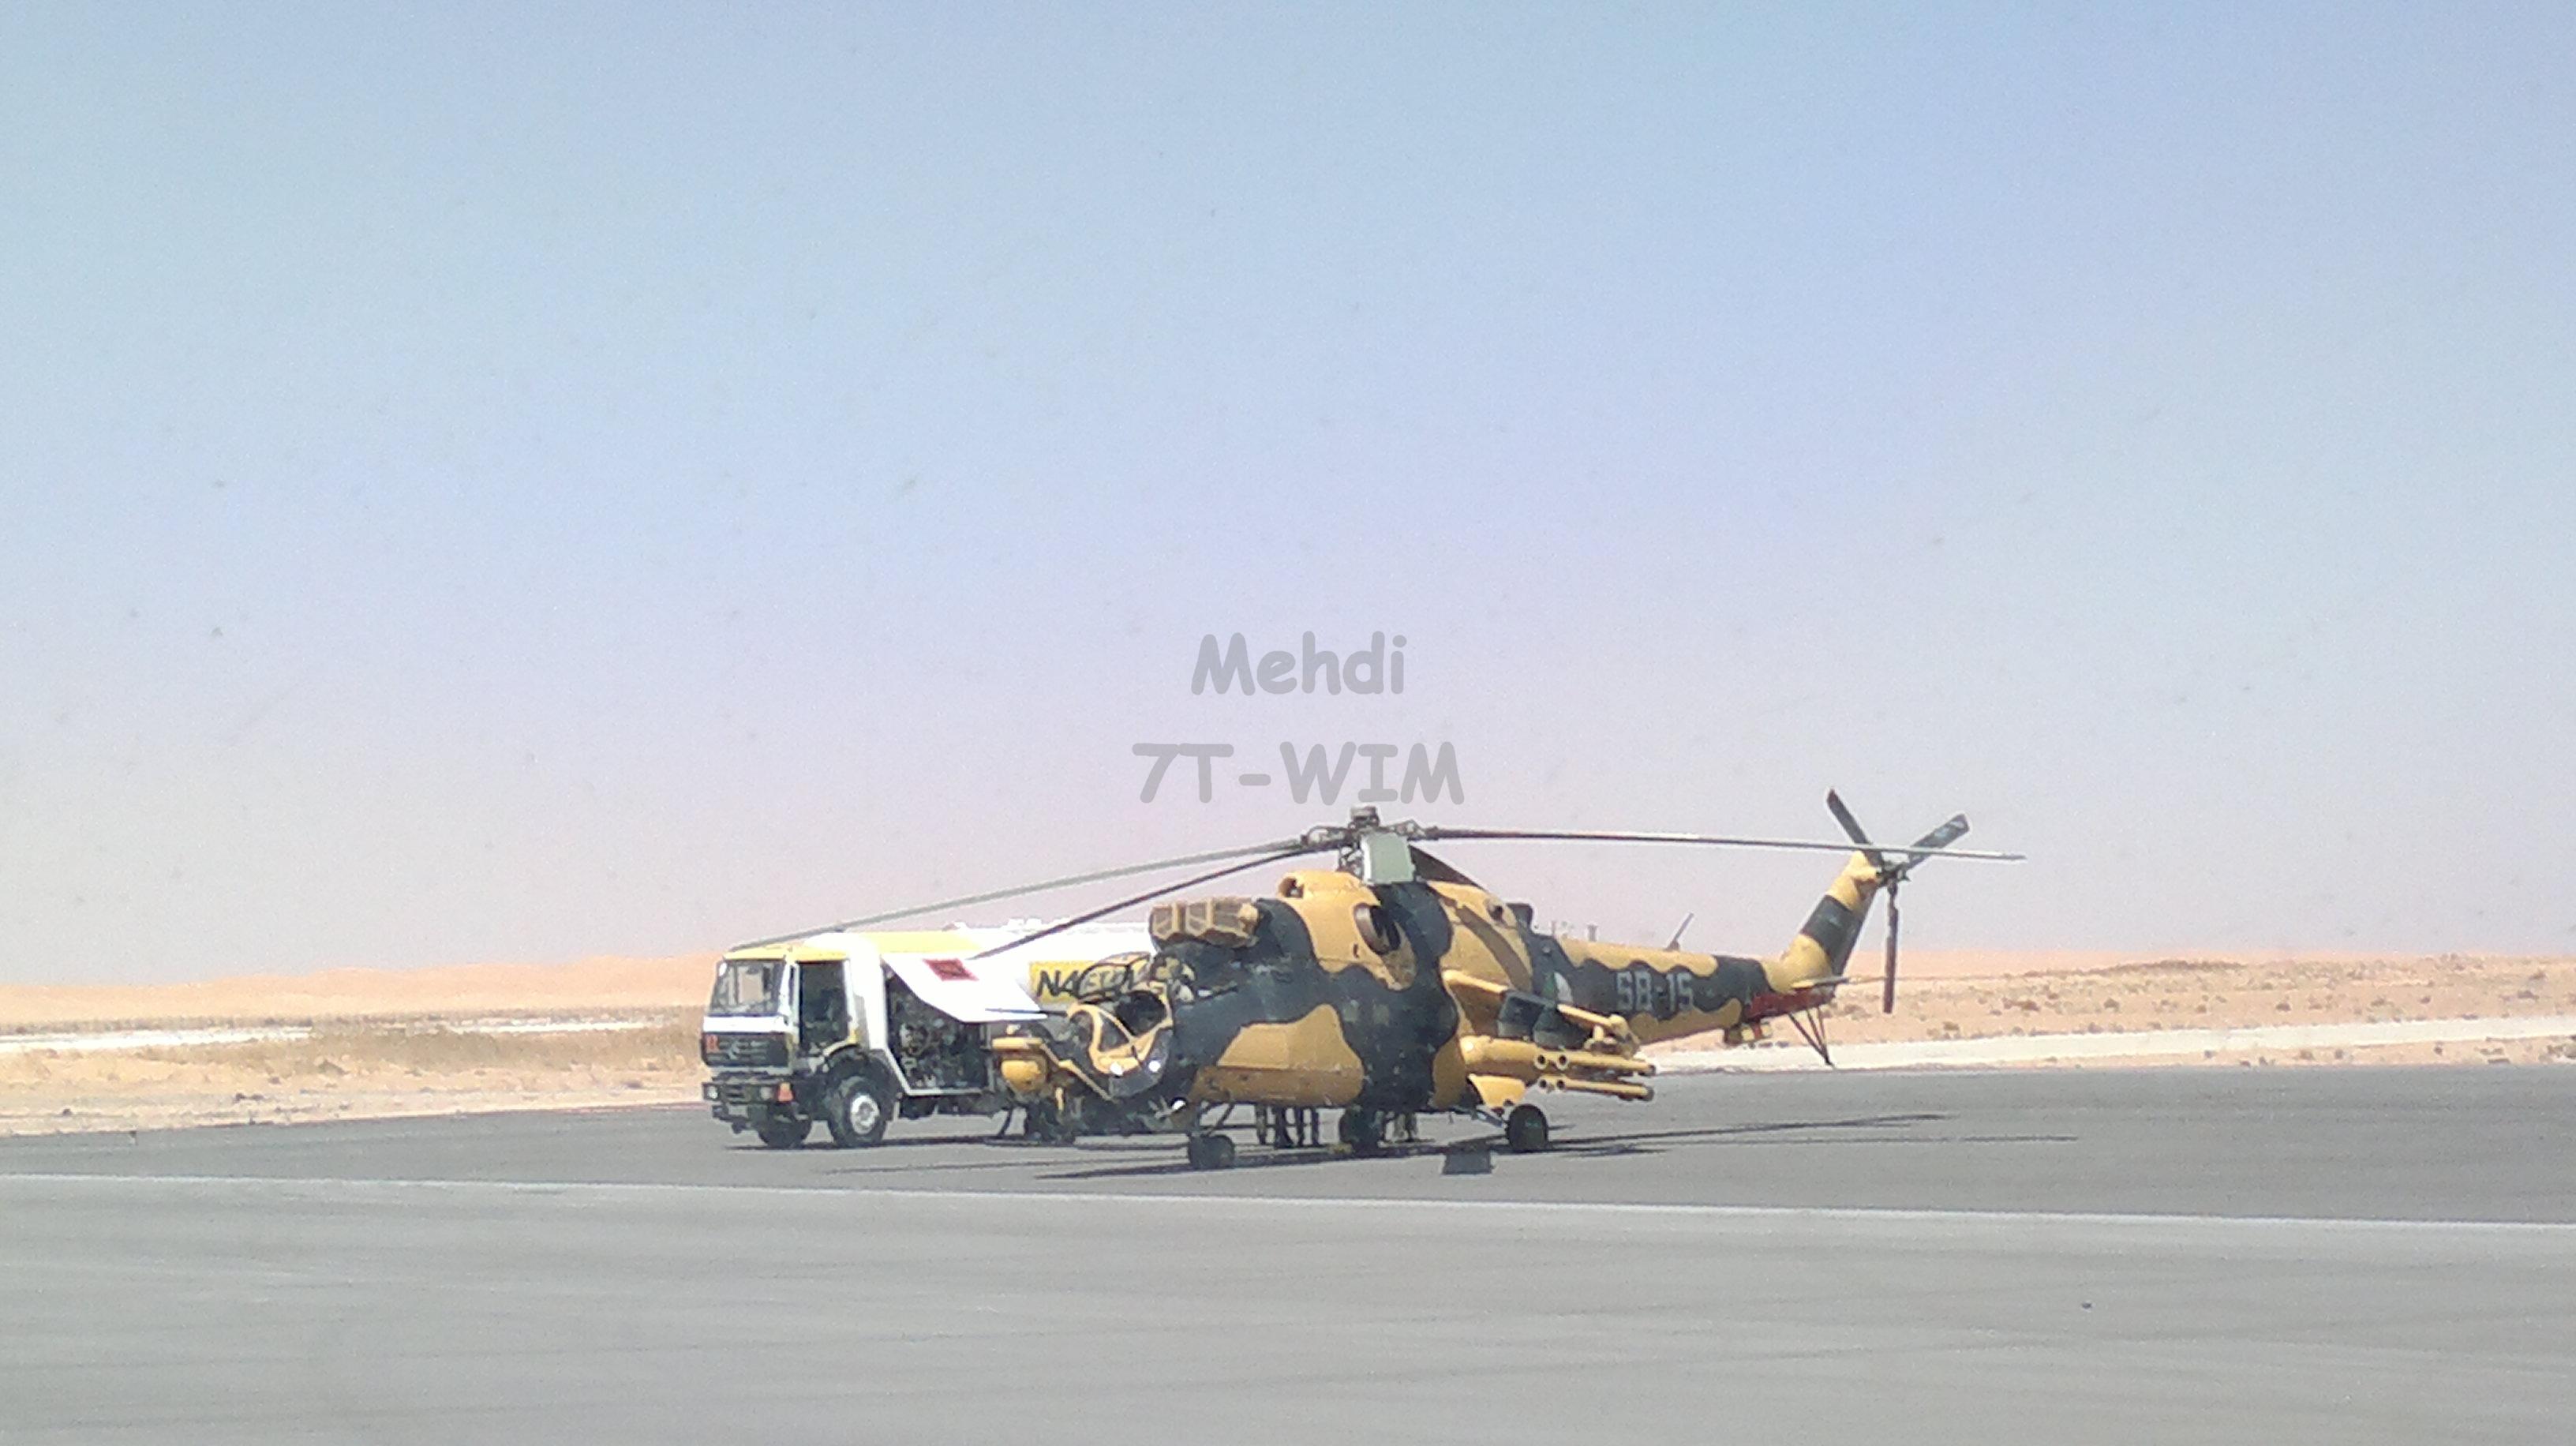 صور مروحيات Mi-24MKIII SuperHind الجزائرية 372963DossierBluetoothExchange00001